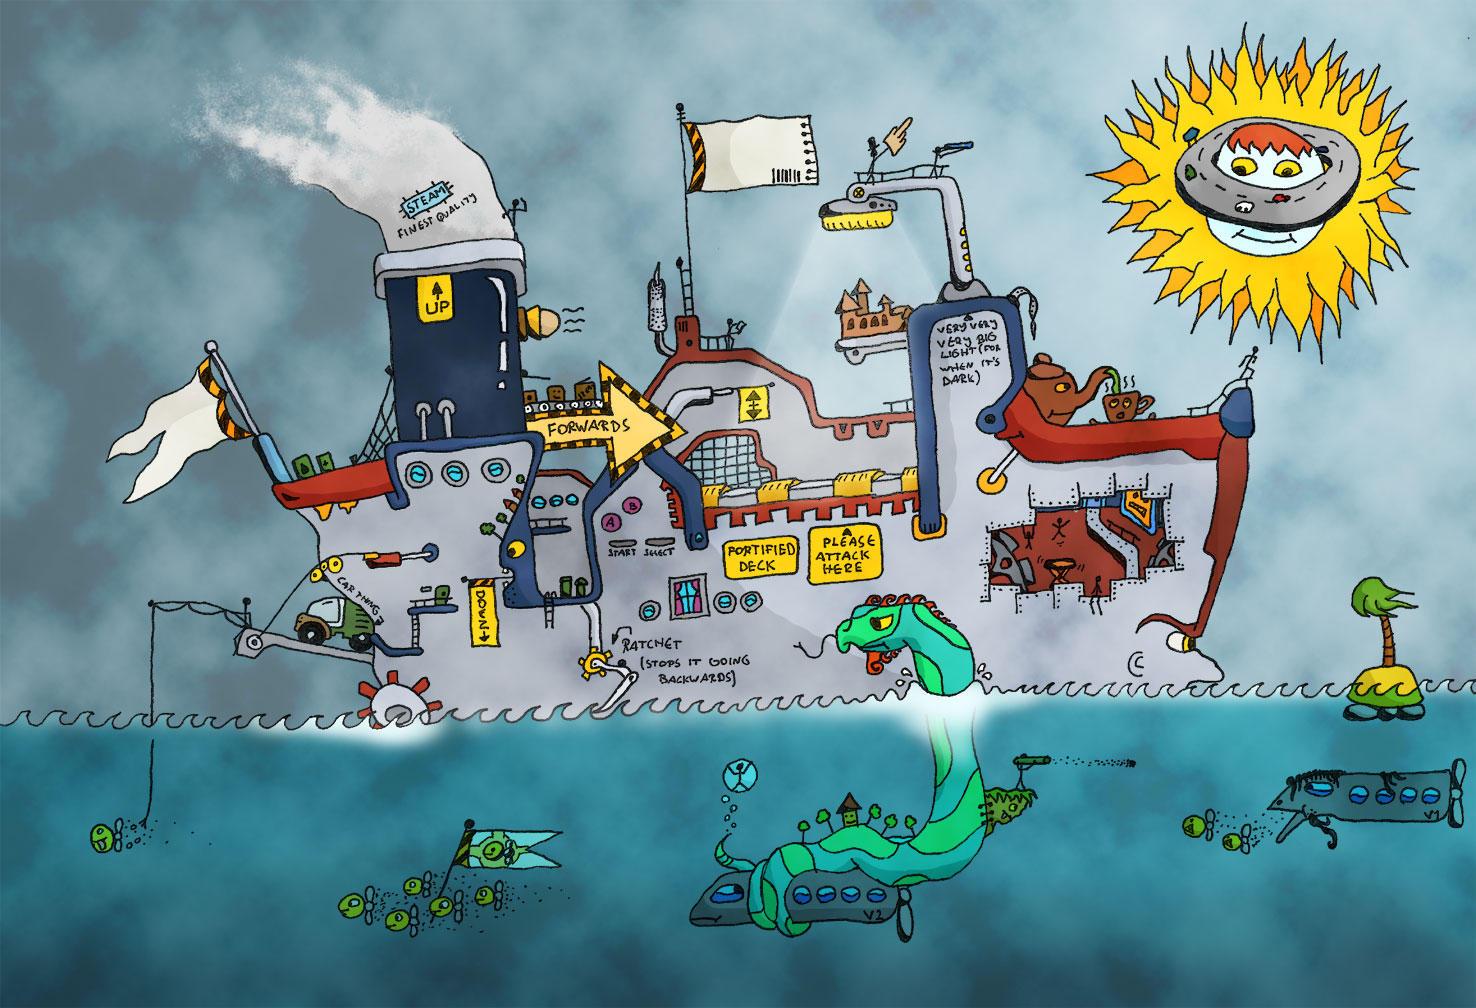 Flantastic Voyage by kakbarnf